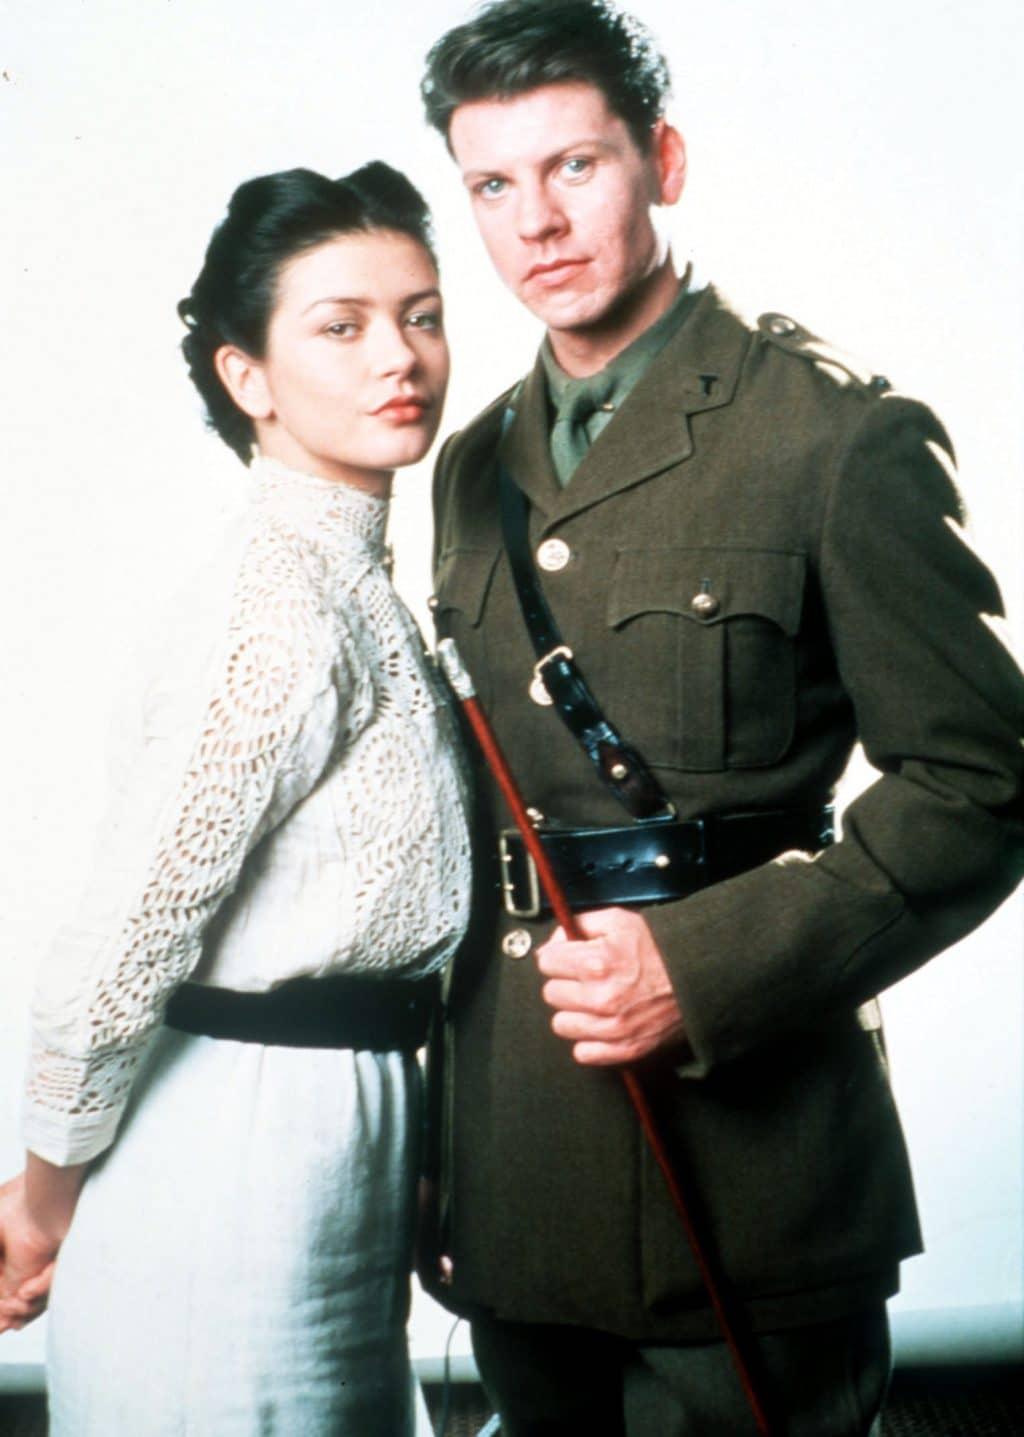 Catherine Cookson - The Cinder Path. (Catherine Zeta-Jones as Victoria Chapman and Lloyd Owen as Charlie MacFell.)